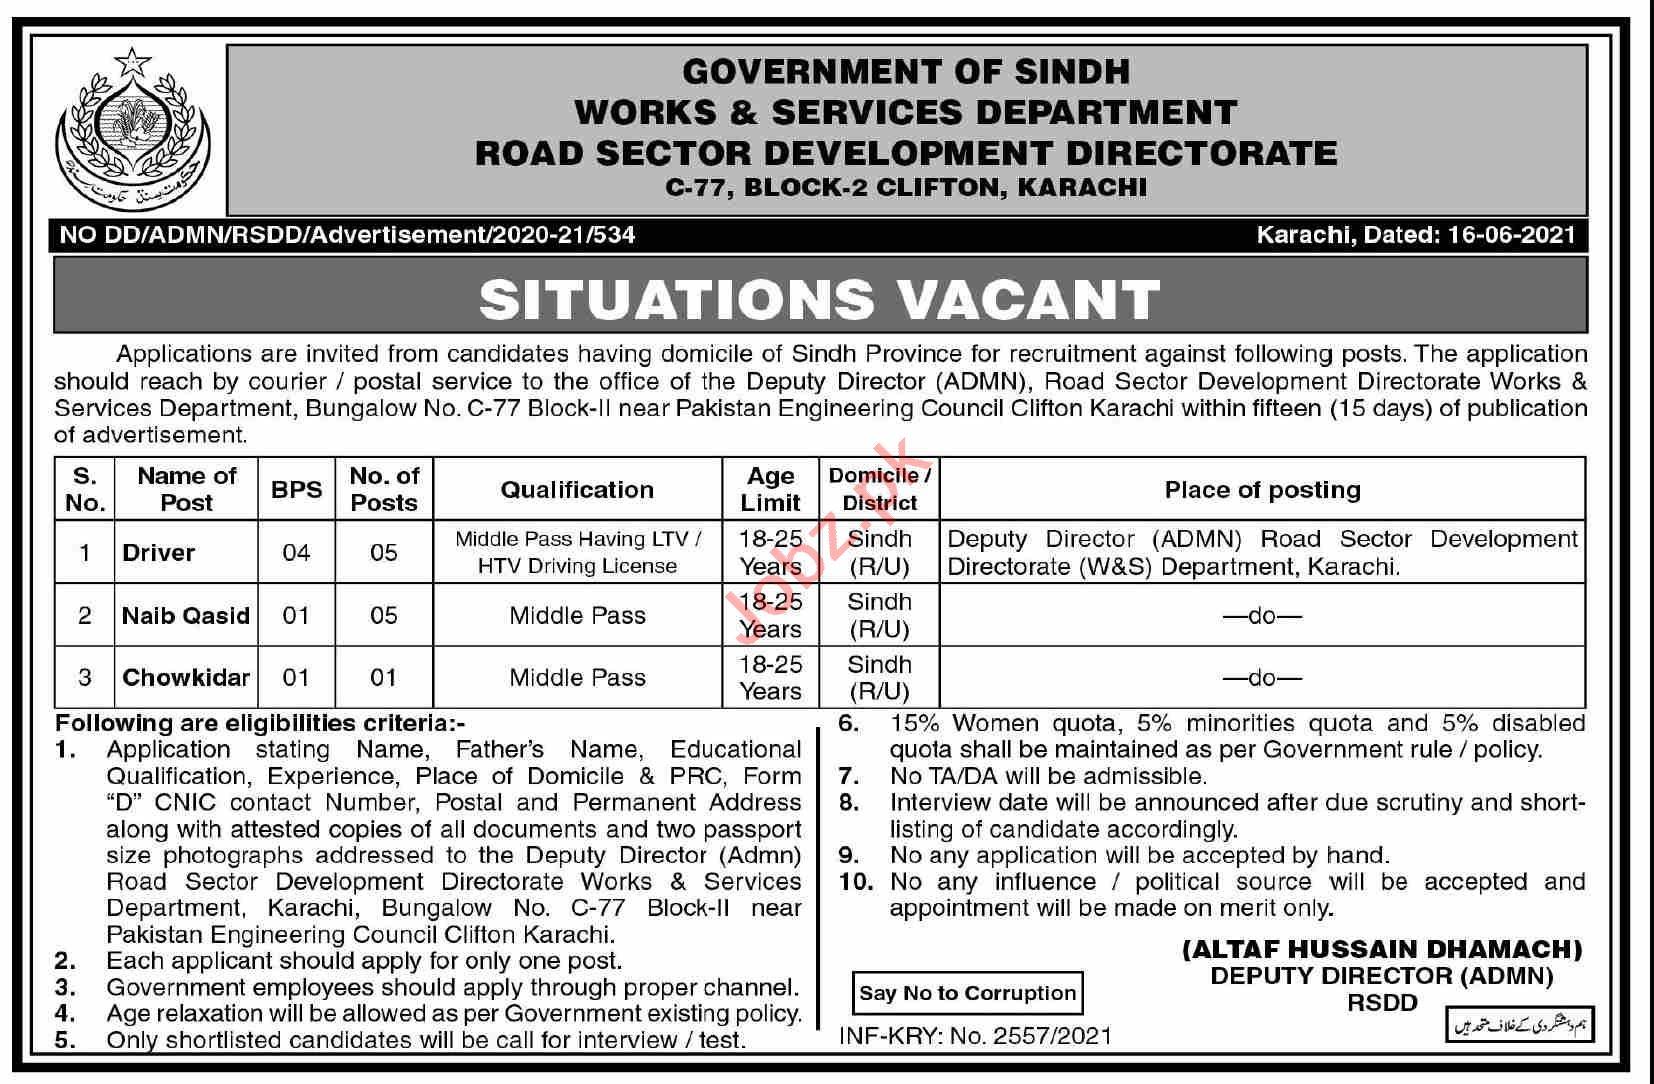 Road Sector Development Directorate Karachi Jobs 2021